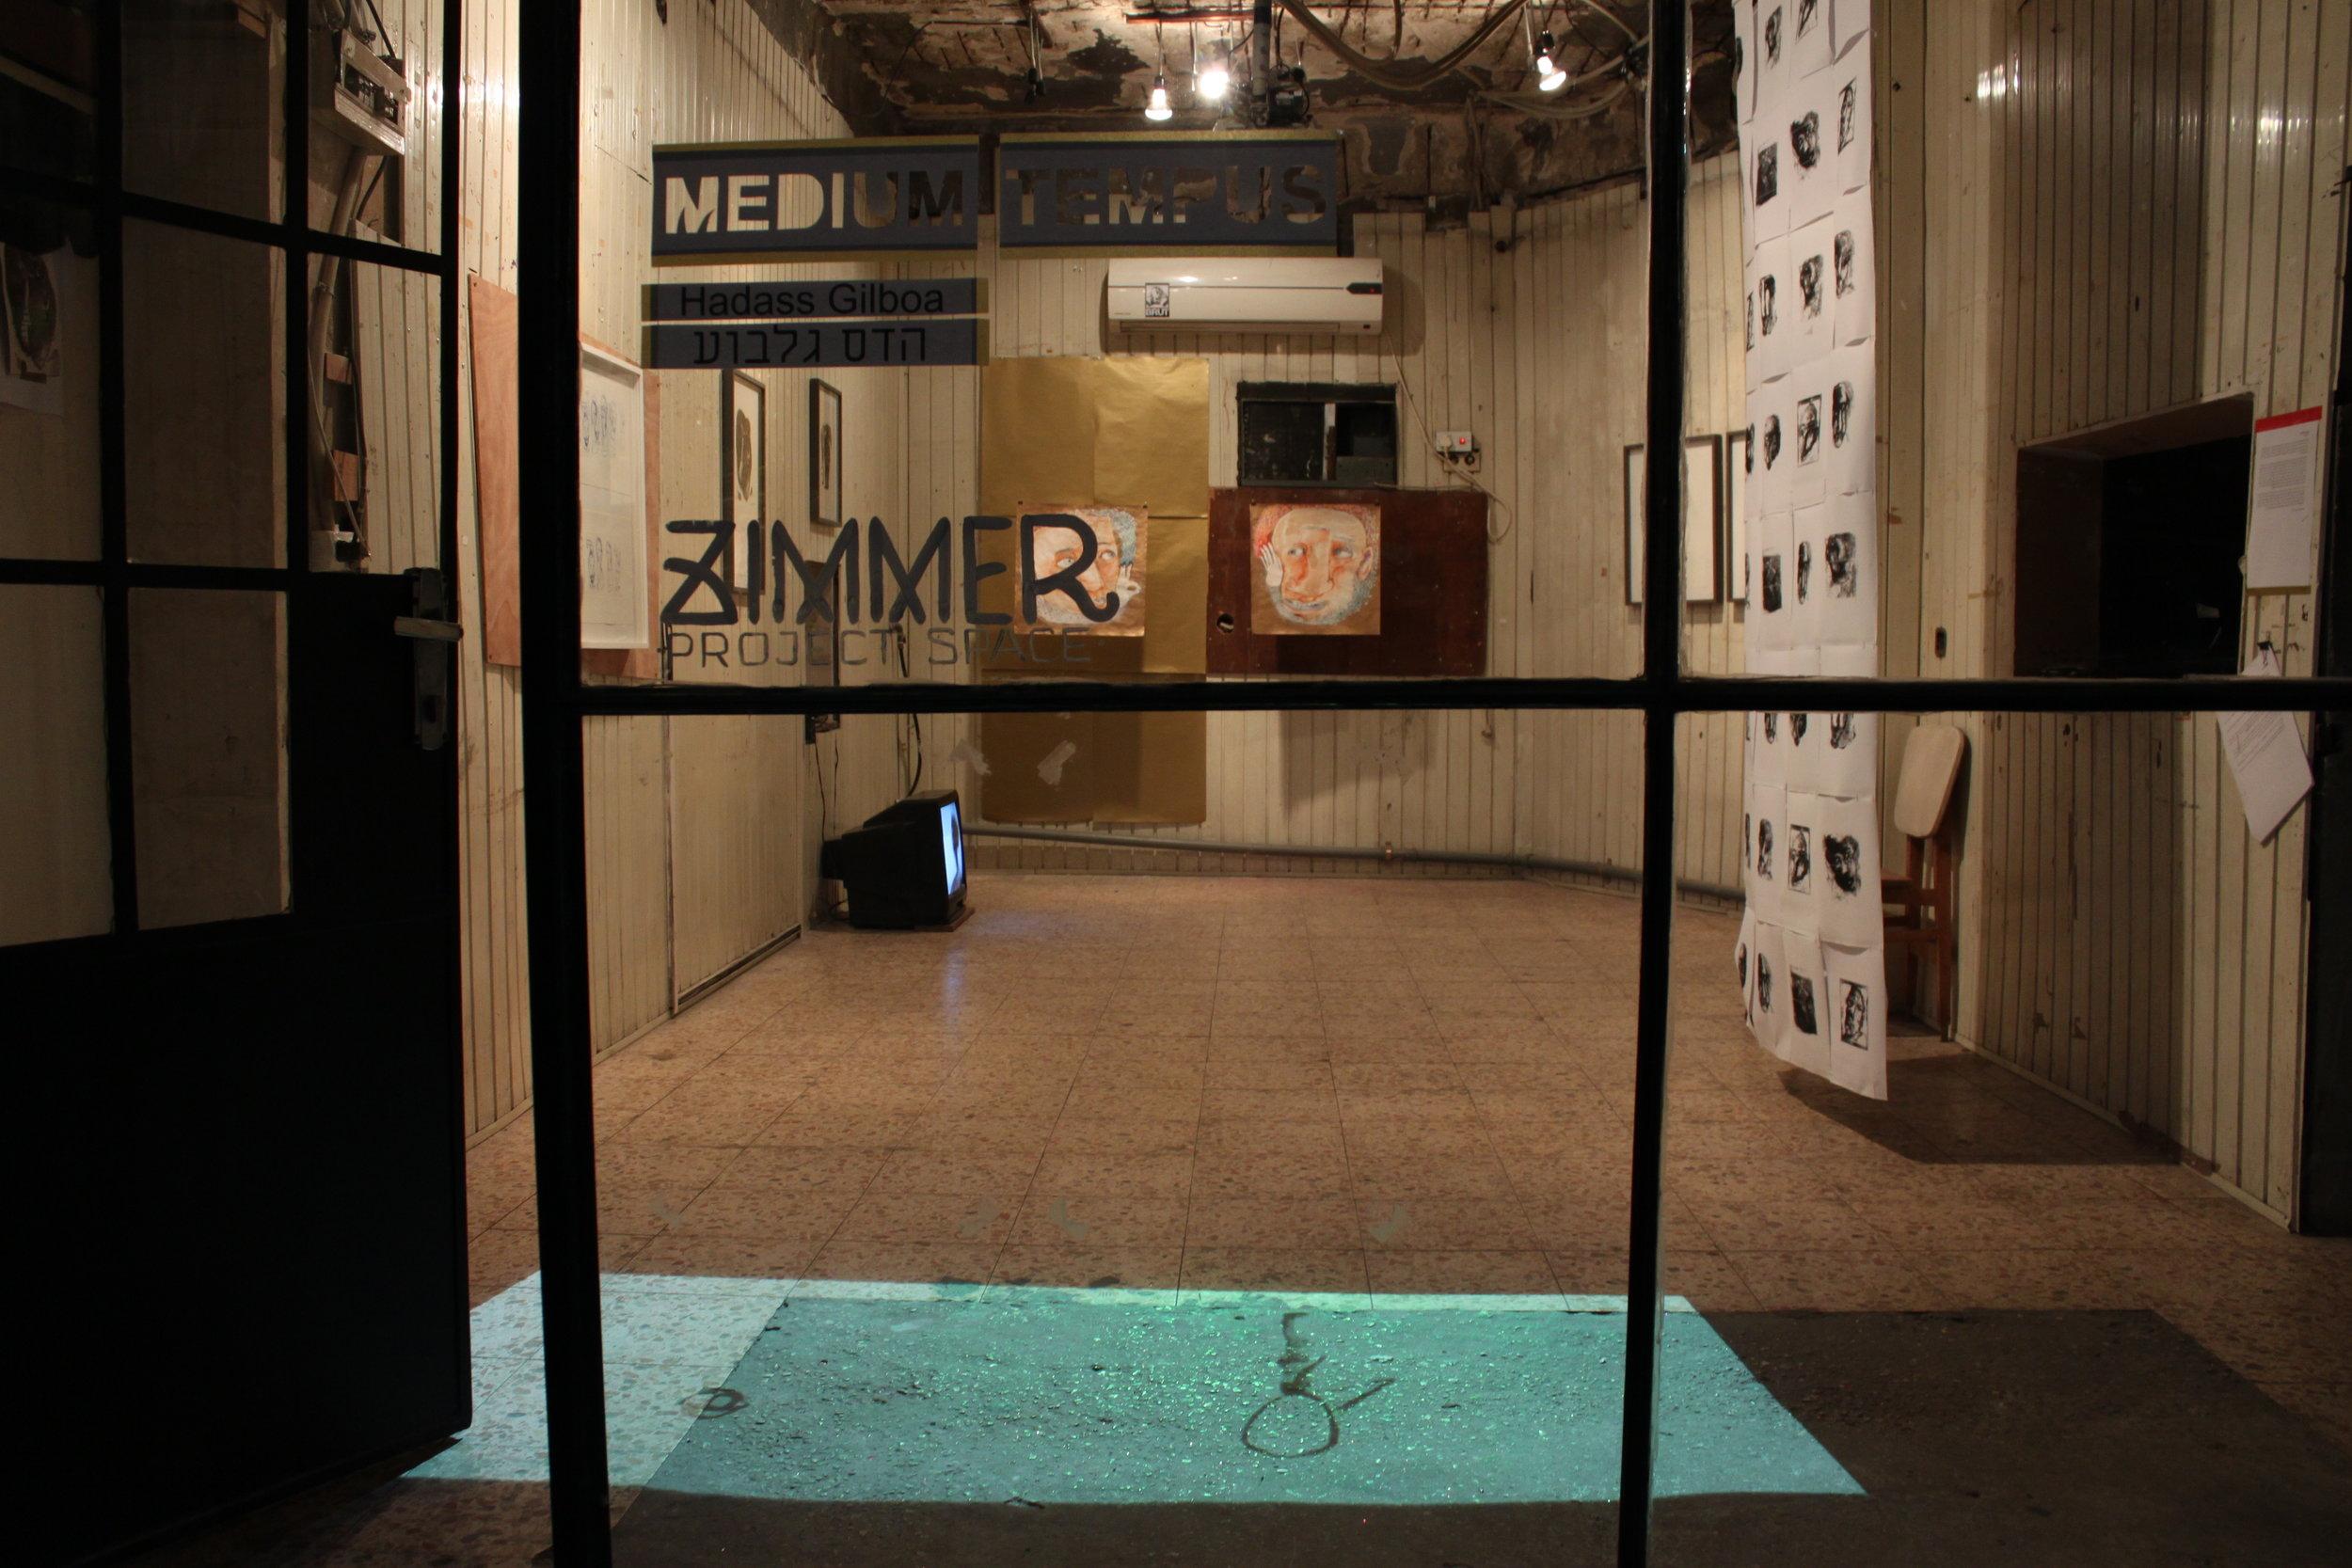 Installation view, Medium Tempus, Zimmer Gallery, December 2015